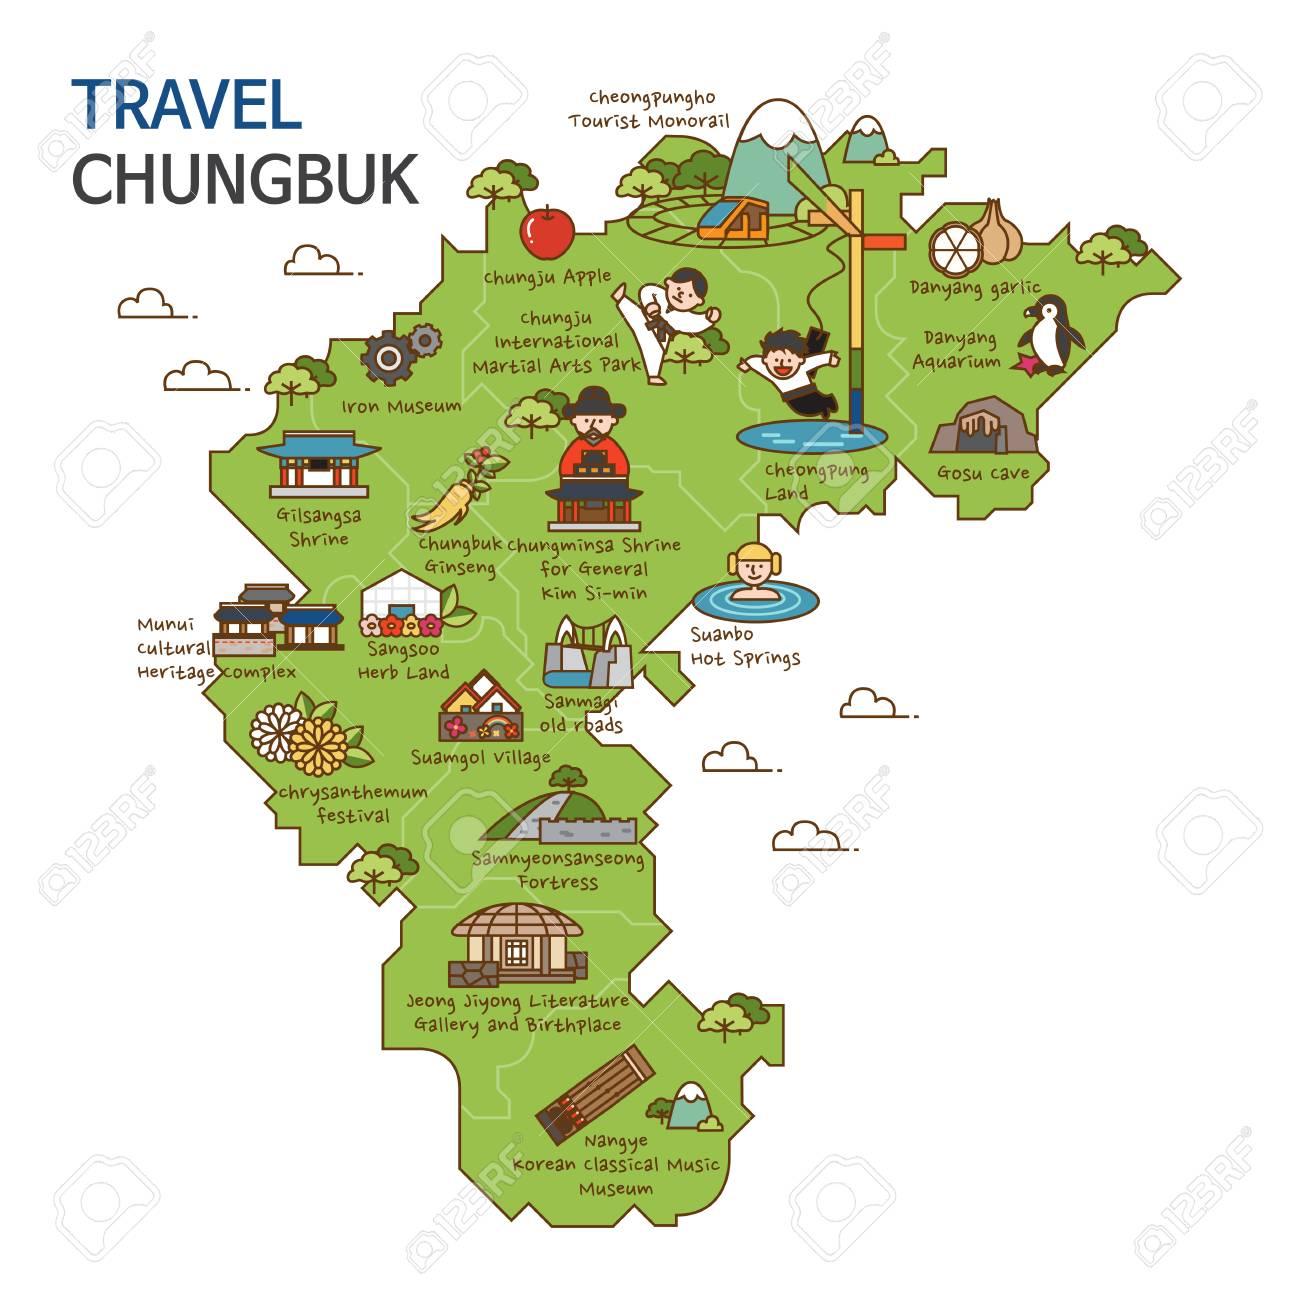 city tourtravel map illustration chungbuk province south korea stock vector 84866335